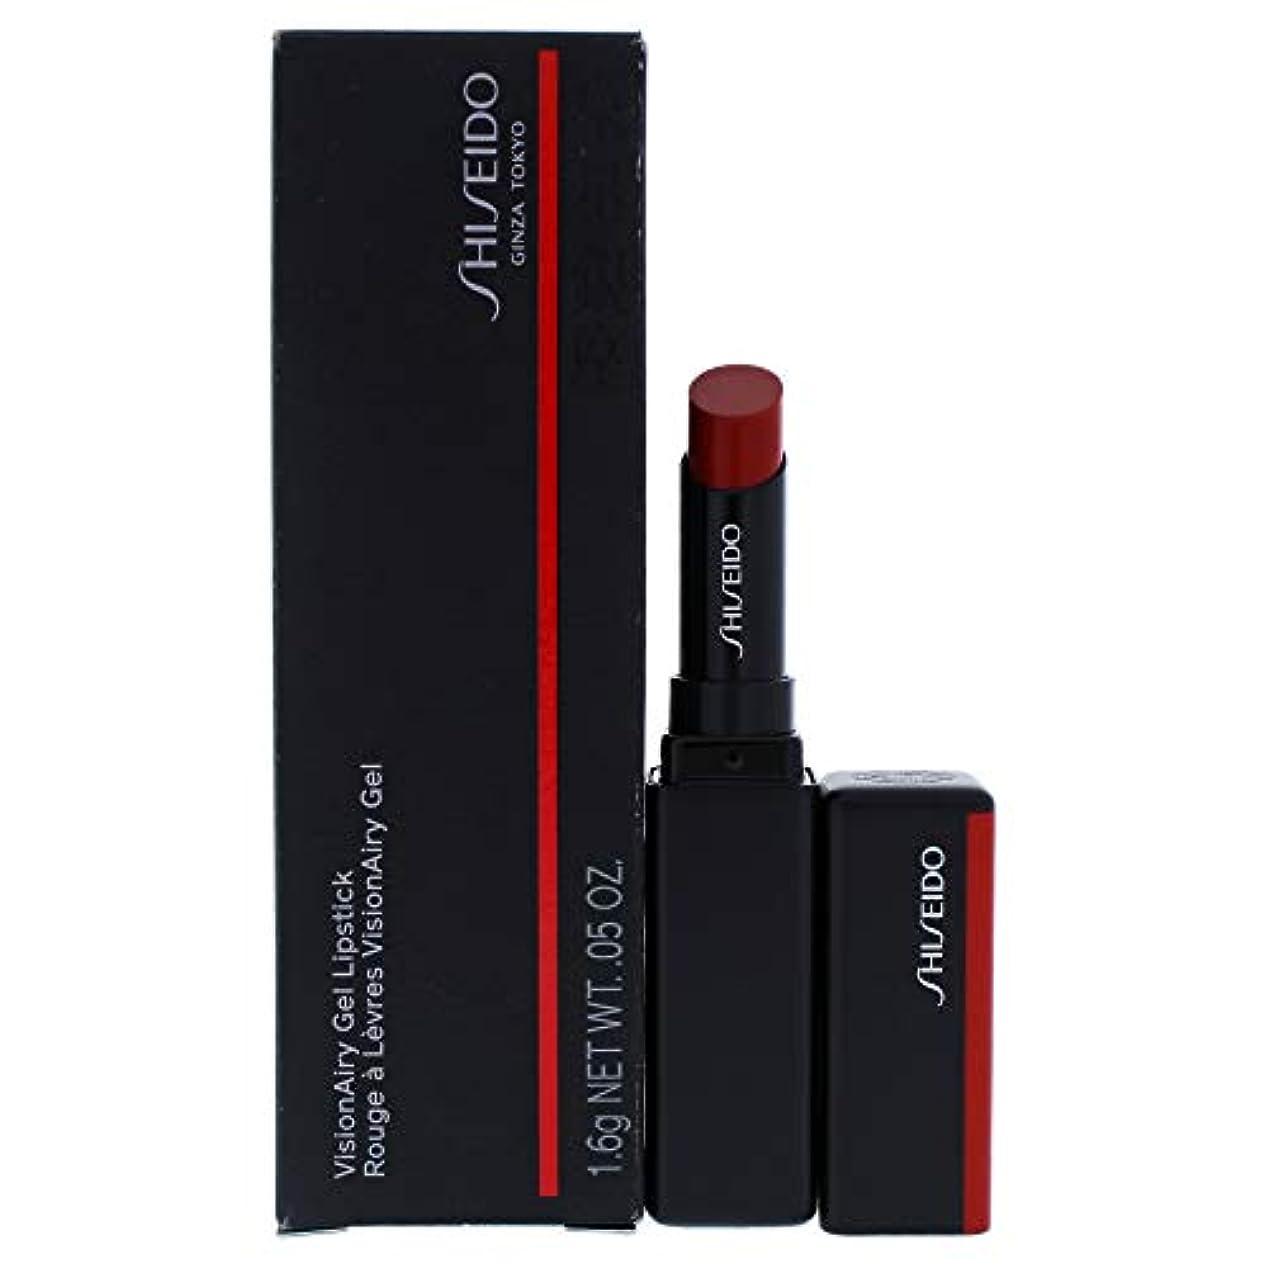 鉱夫休憩郵便番号資生堂 VisionAiry Gel Lipstick - # 221 Code Red (Ruby Red) 1.6g/0.05oz並行輸入品